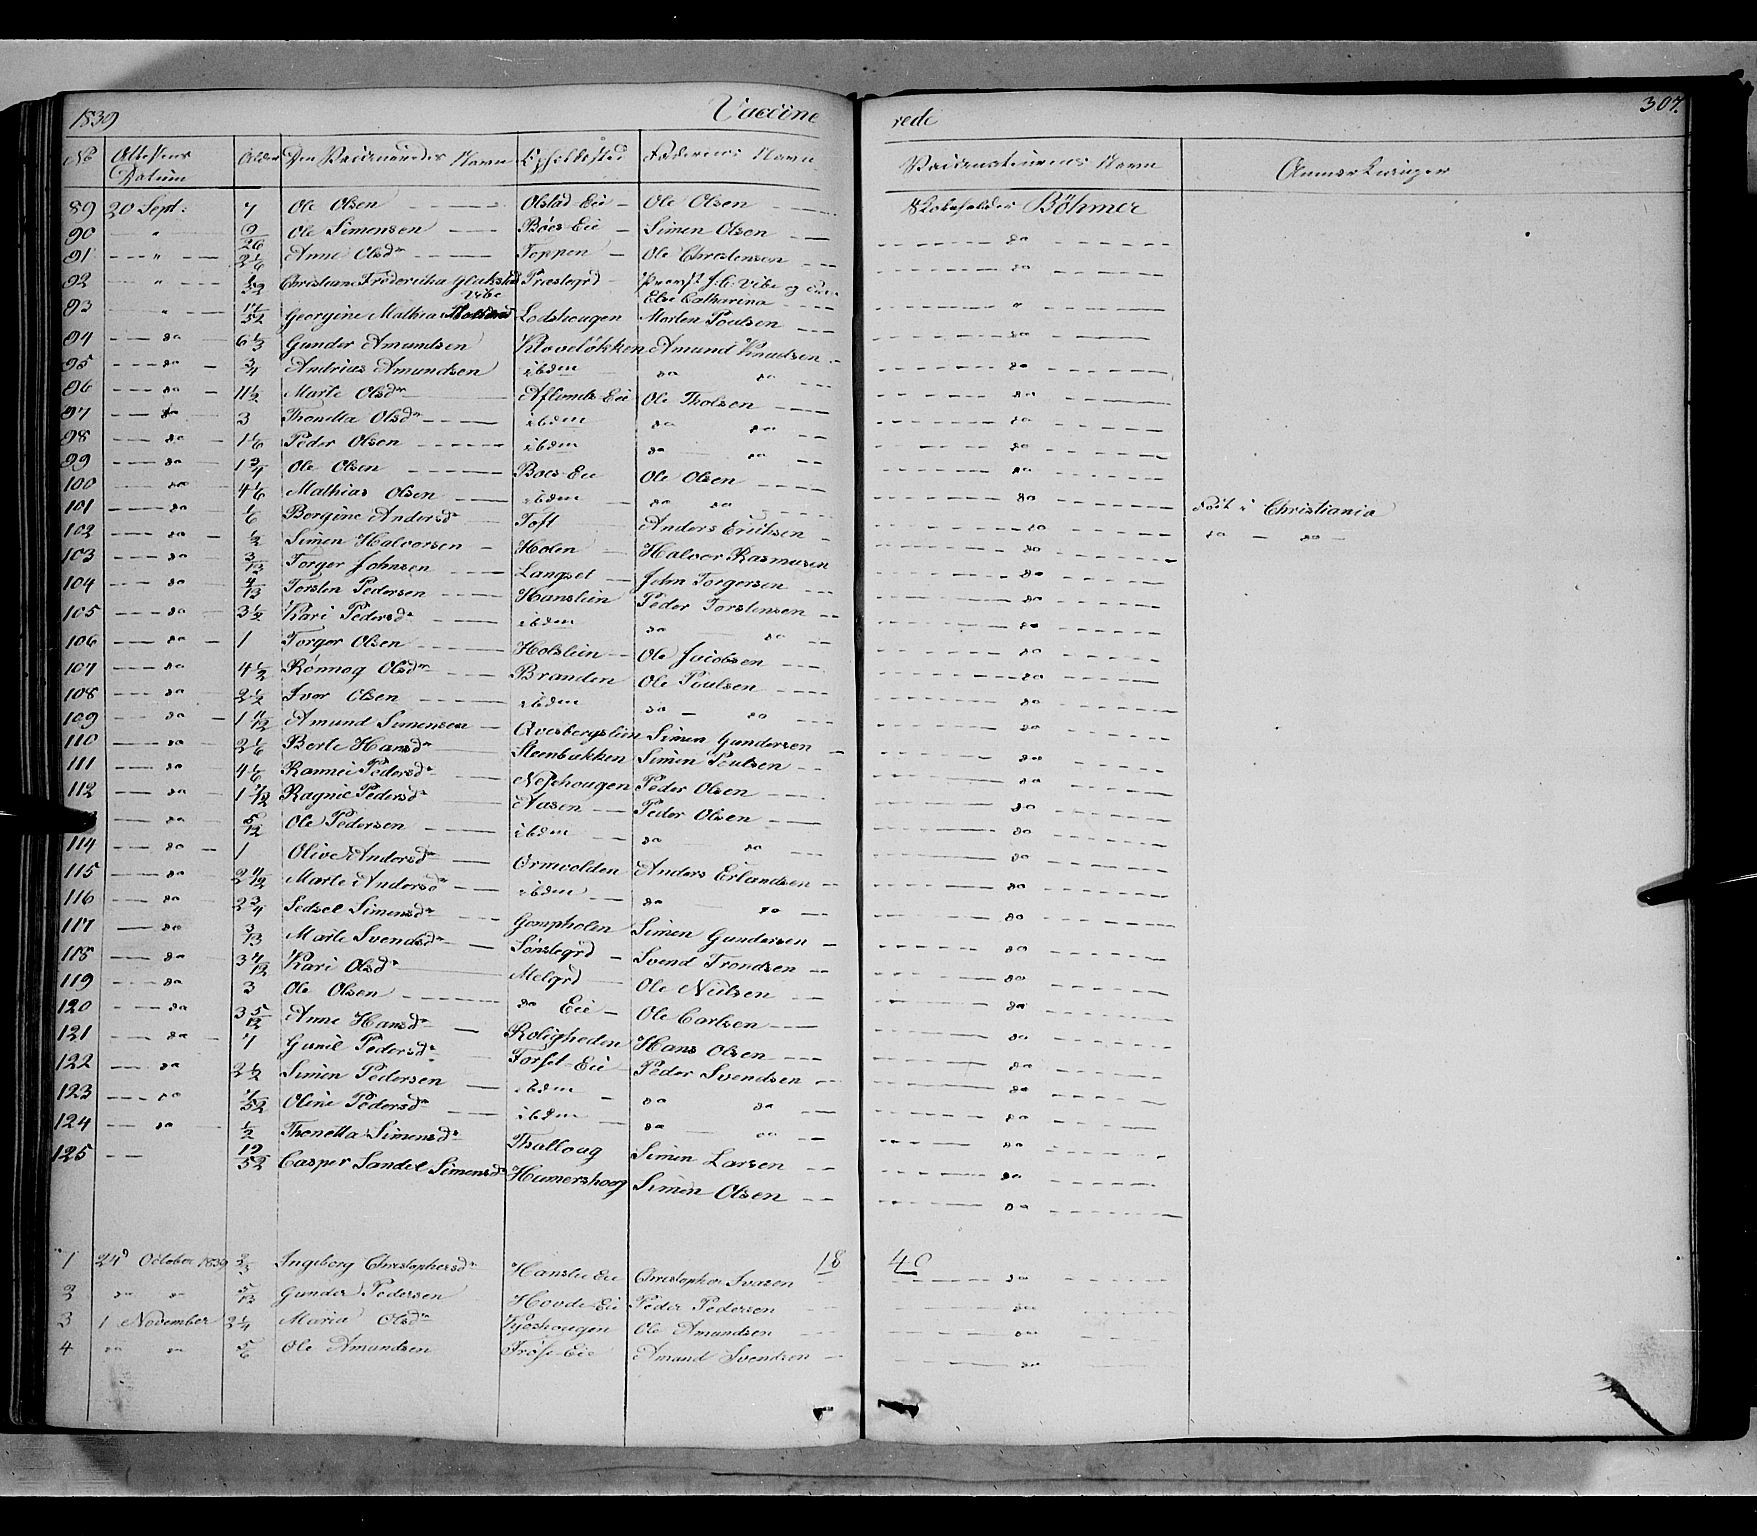 SAH, Gausdal prestekontor, Ministerialbok nr. 7, 1840-1850, s. 307